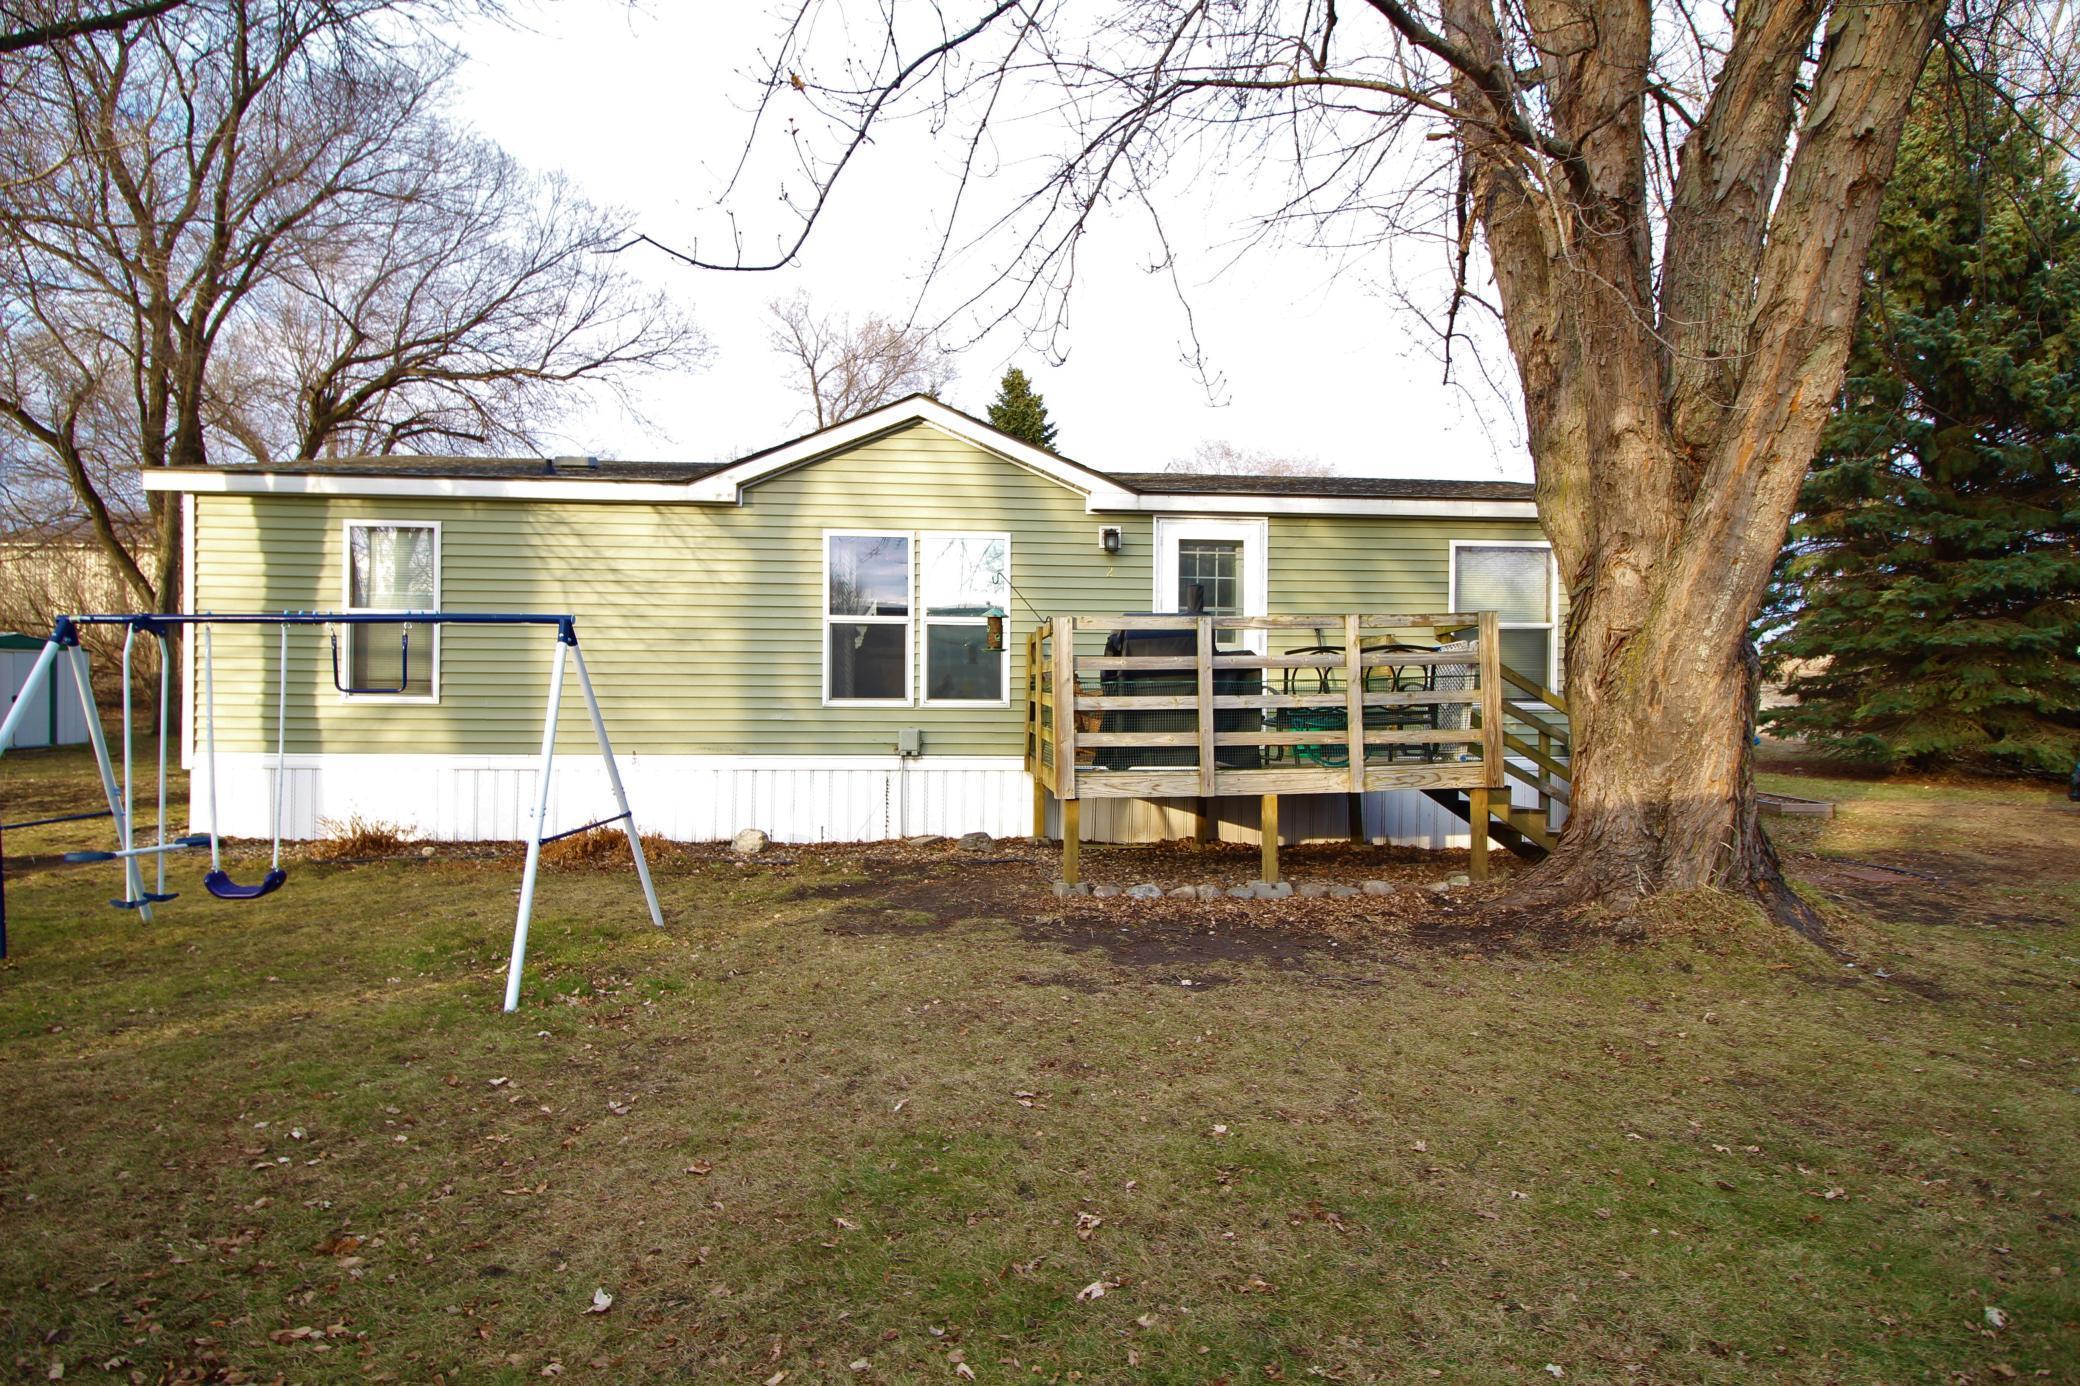 20765 Hwy 55 #2 Property Photo - Glenwood, MN real estate listing